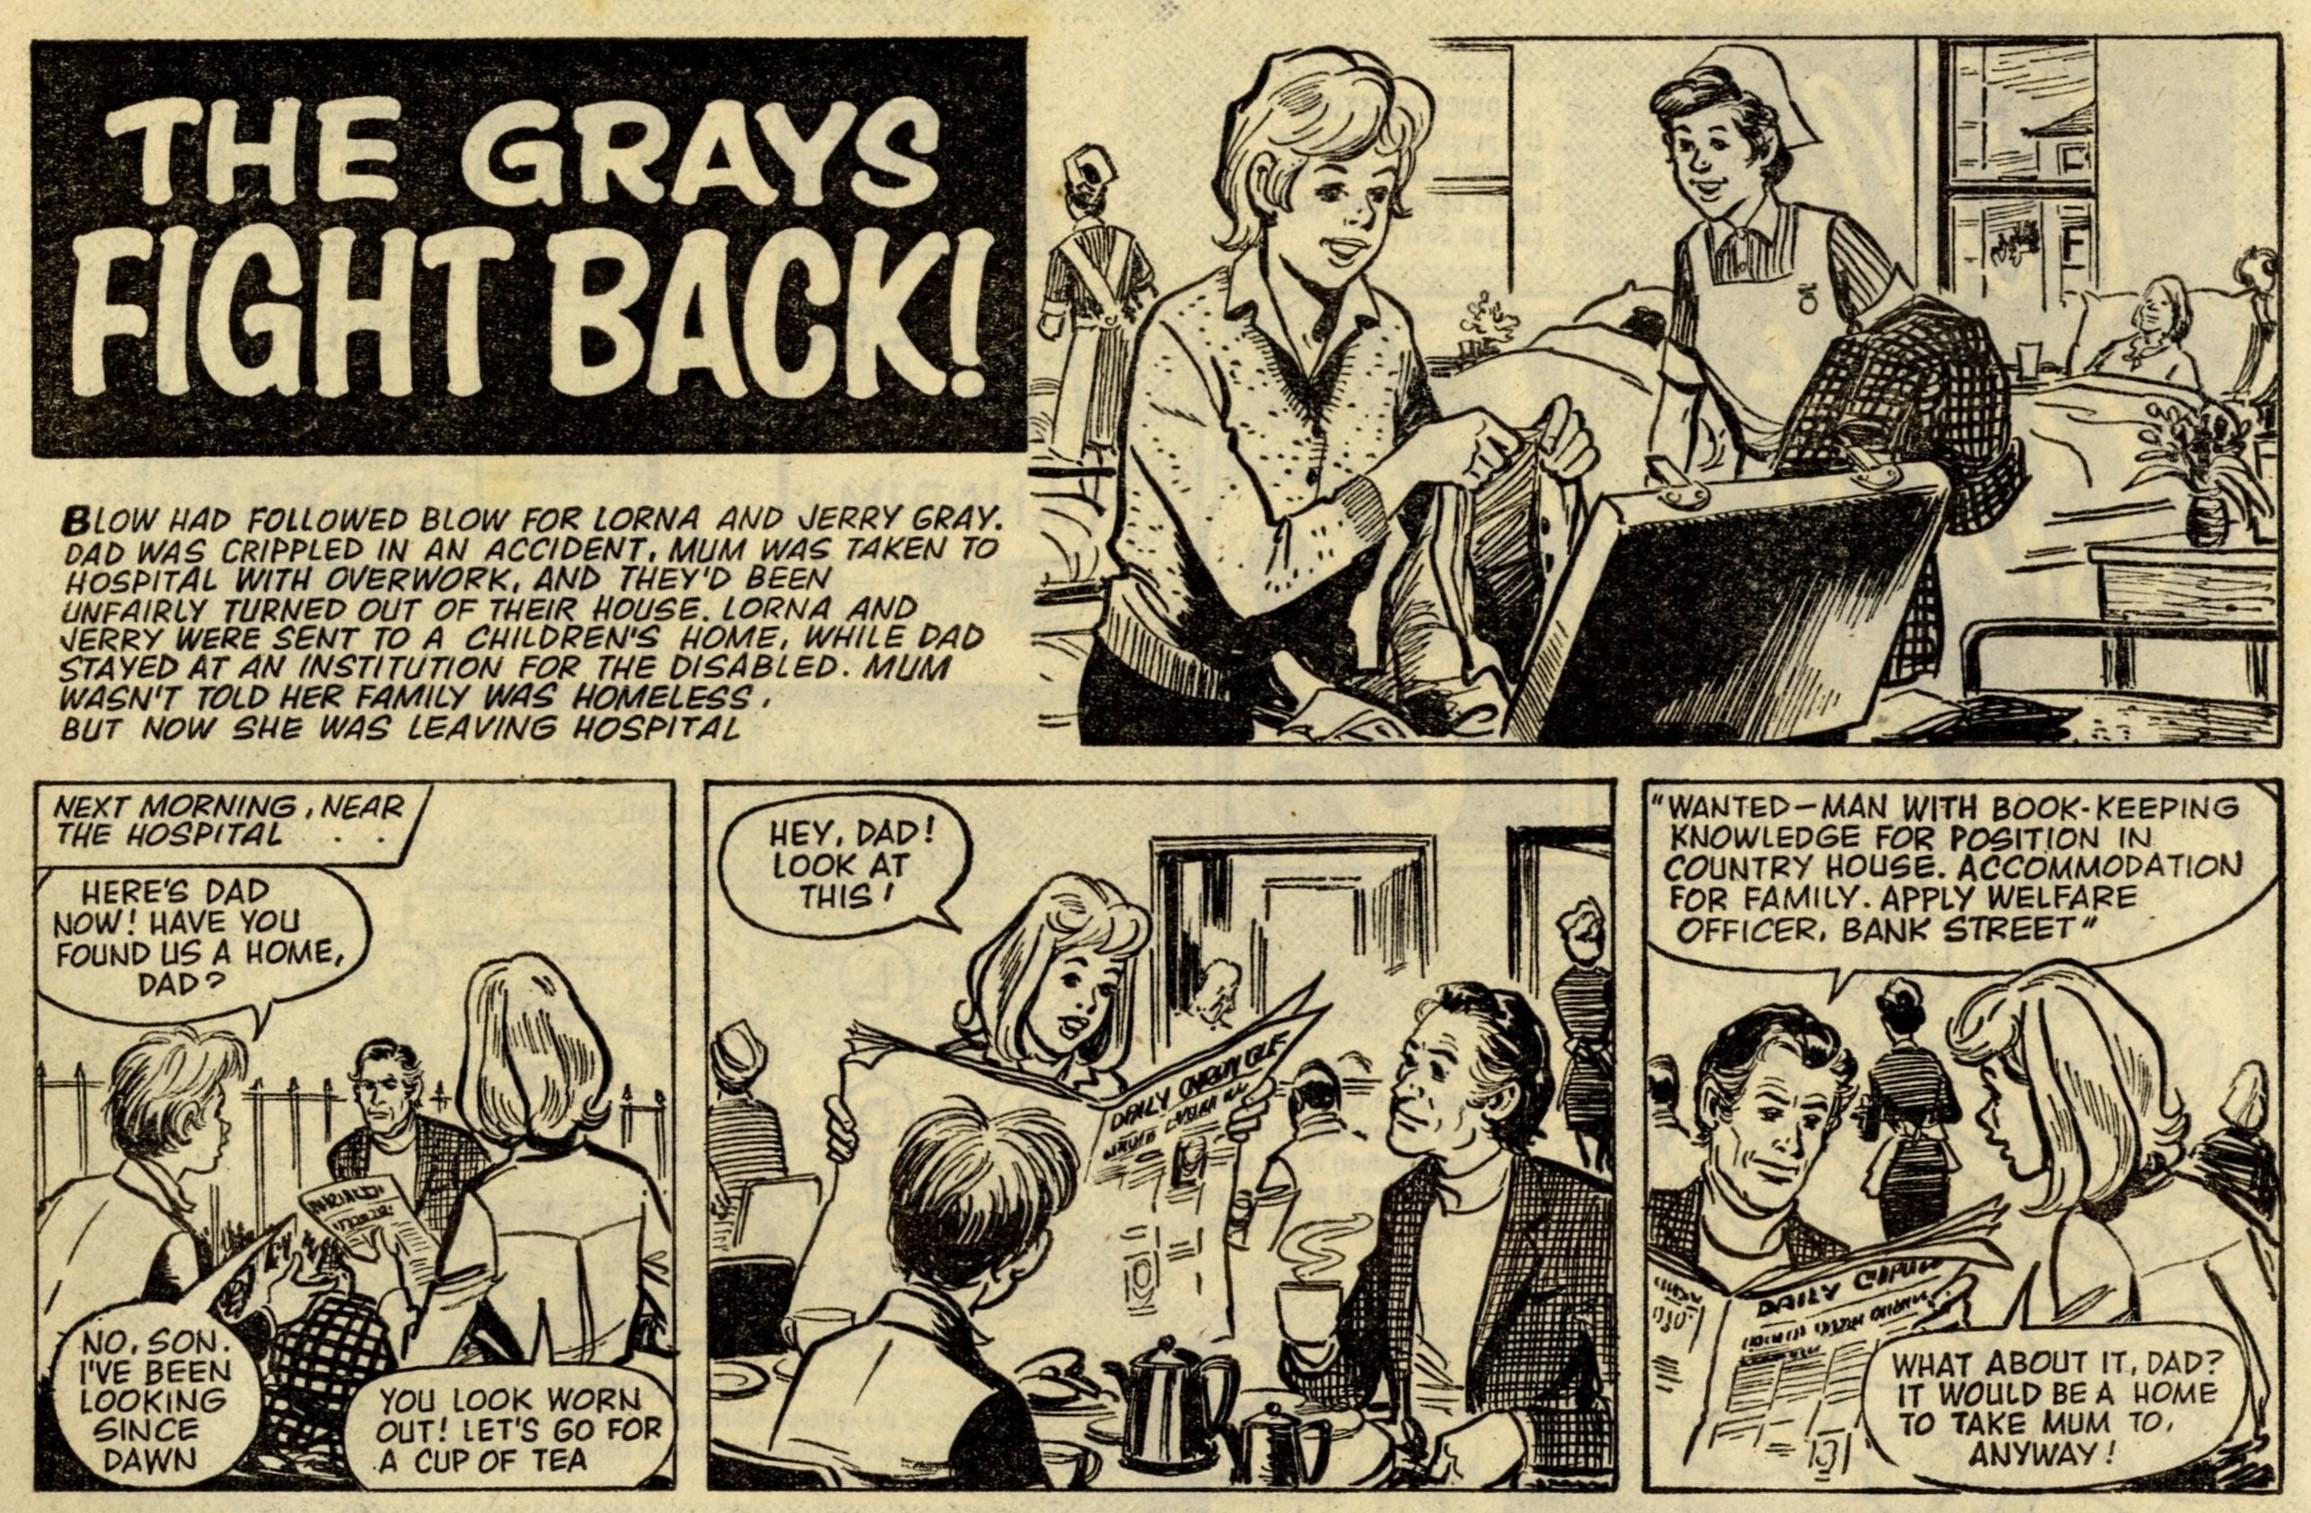 The Grays Fight Back!: Robert MacGillivray (artist)